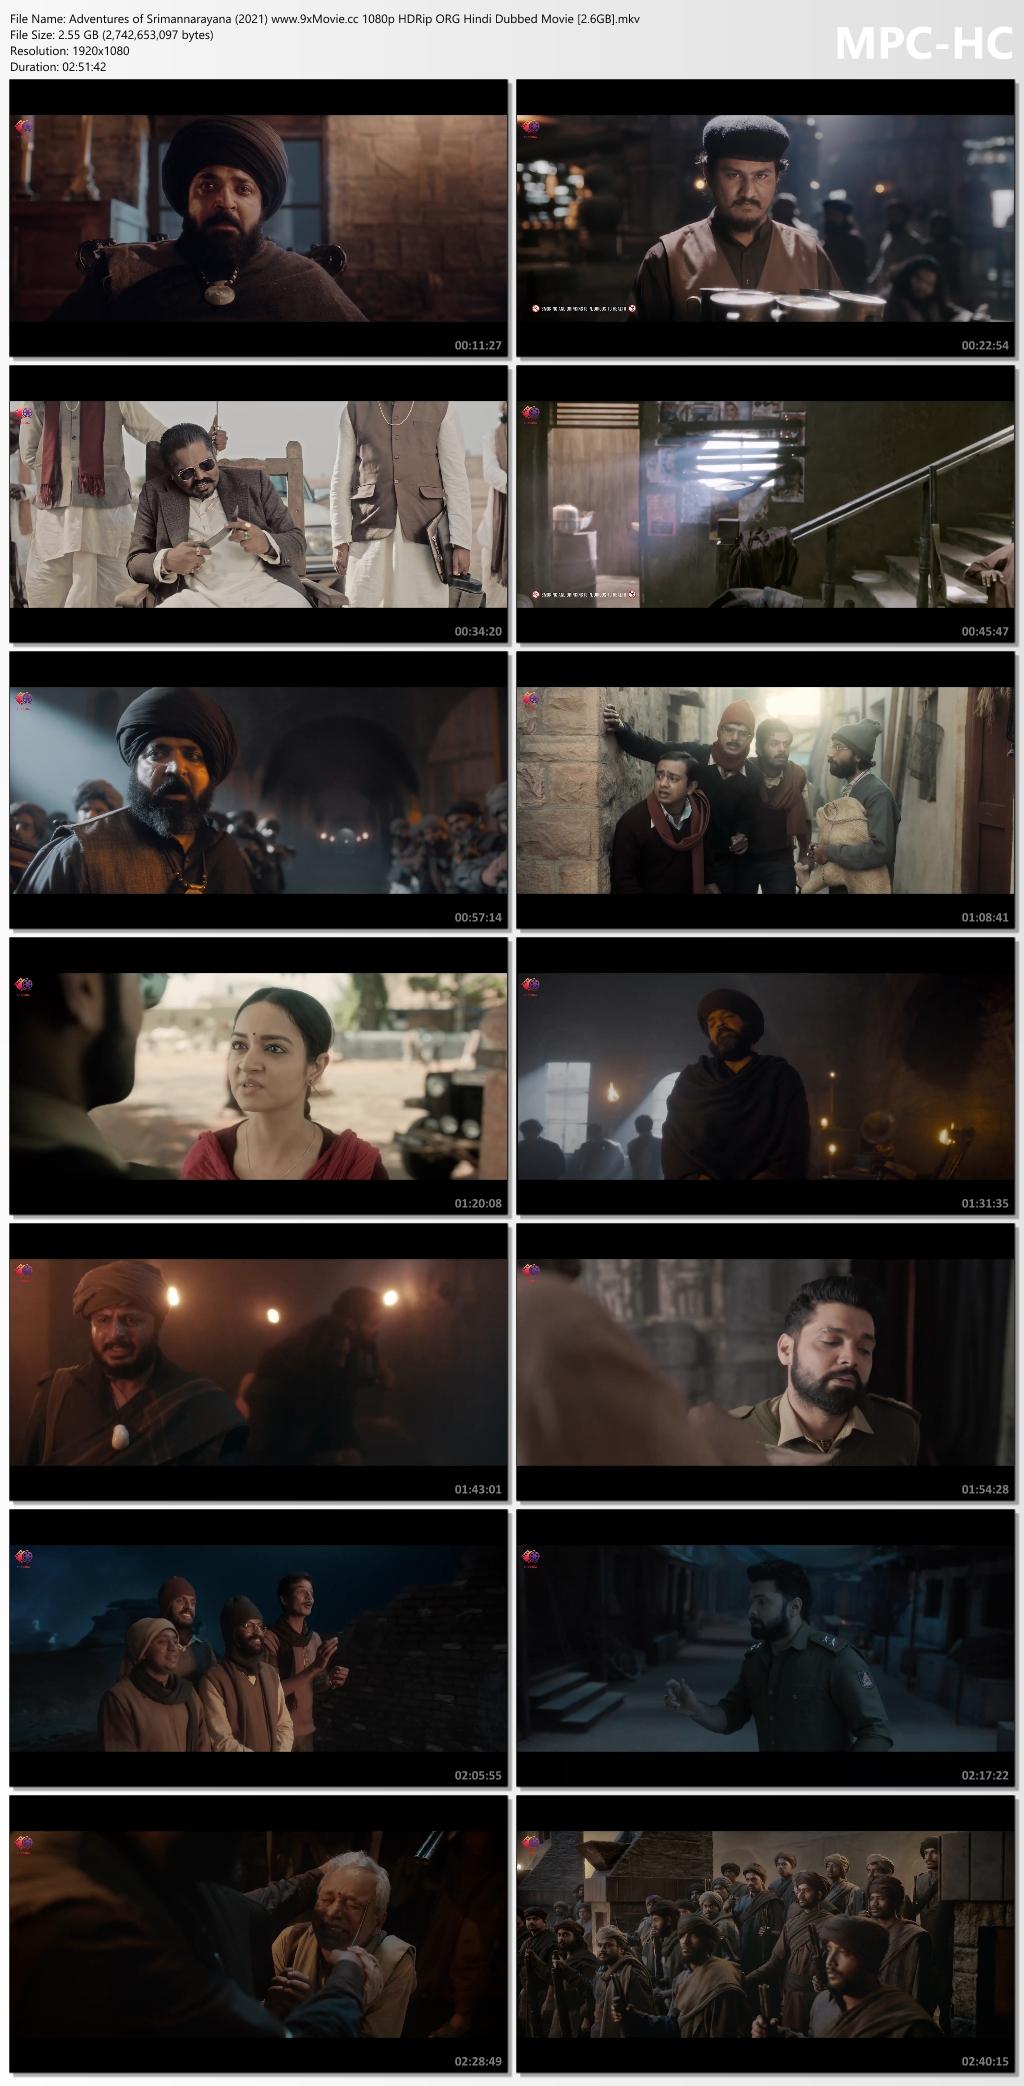 Adventures-of-Srimannarayana-2021-www-9x-Movie-cc-1080p-HDRip-ORG-Hindi-Dubbed-Movie-2-6-GB-mkv